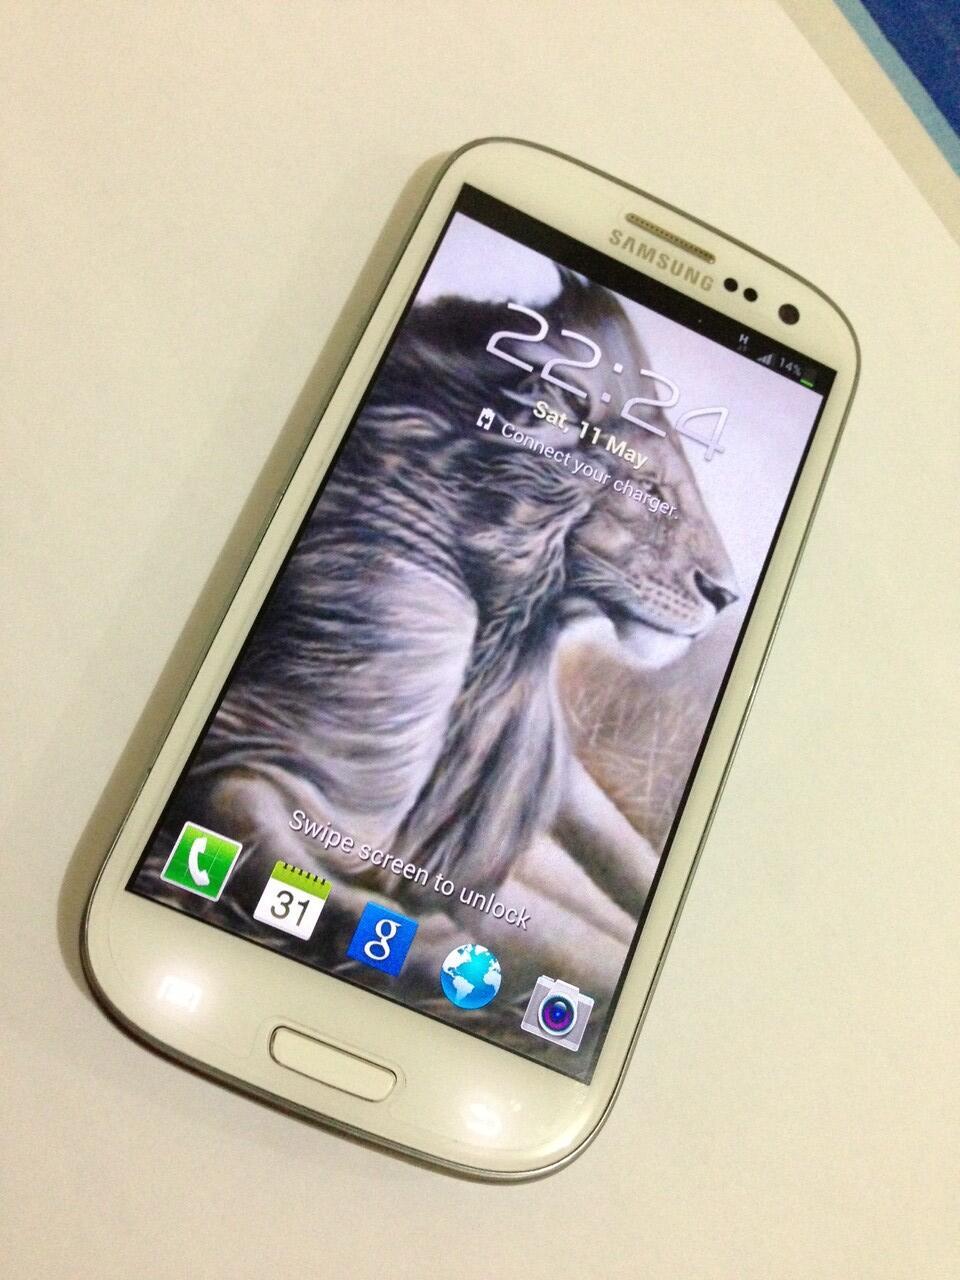 Samsung Galaxy S3 Marble White   Garansi & Murah !!